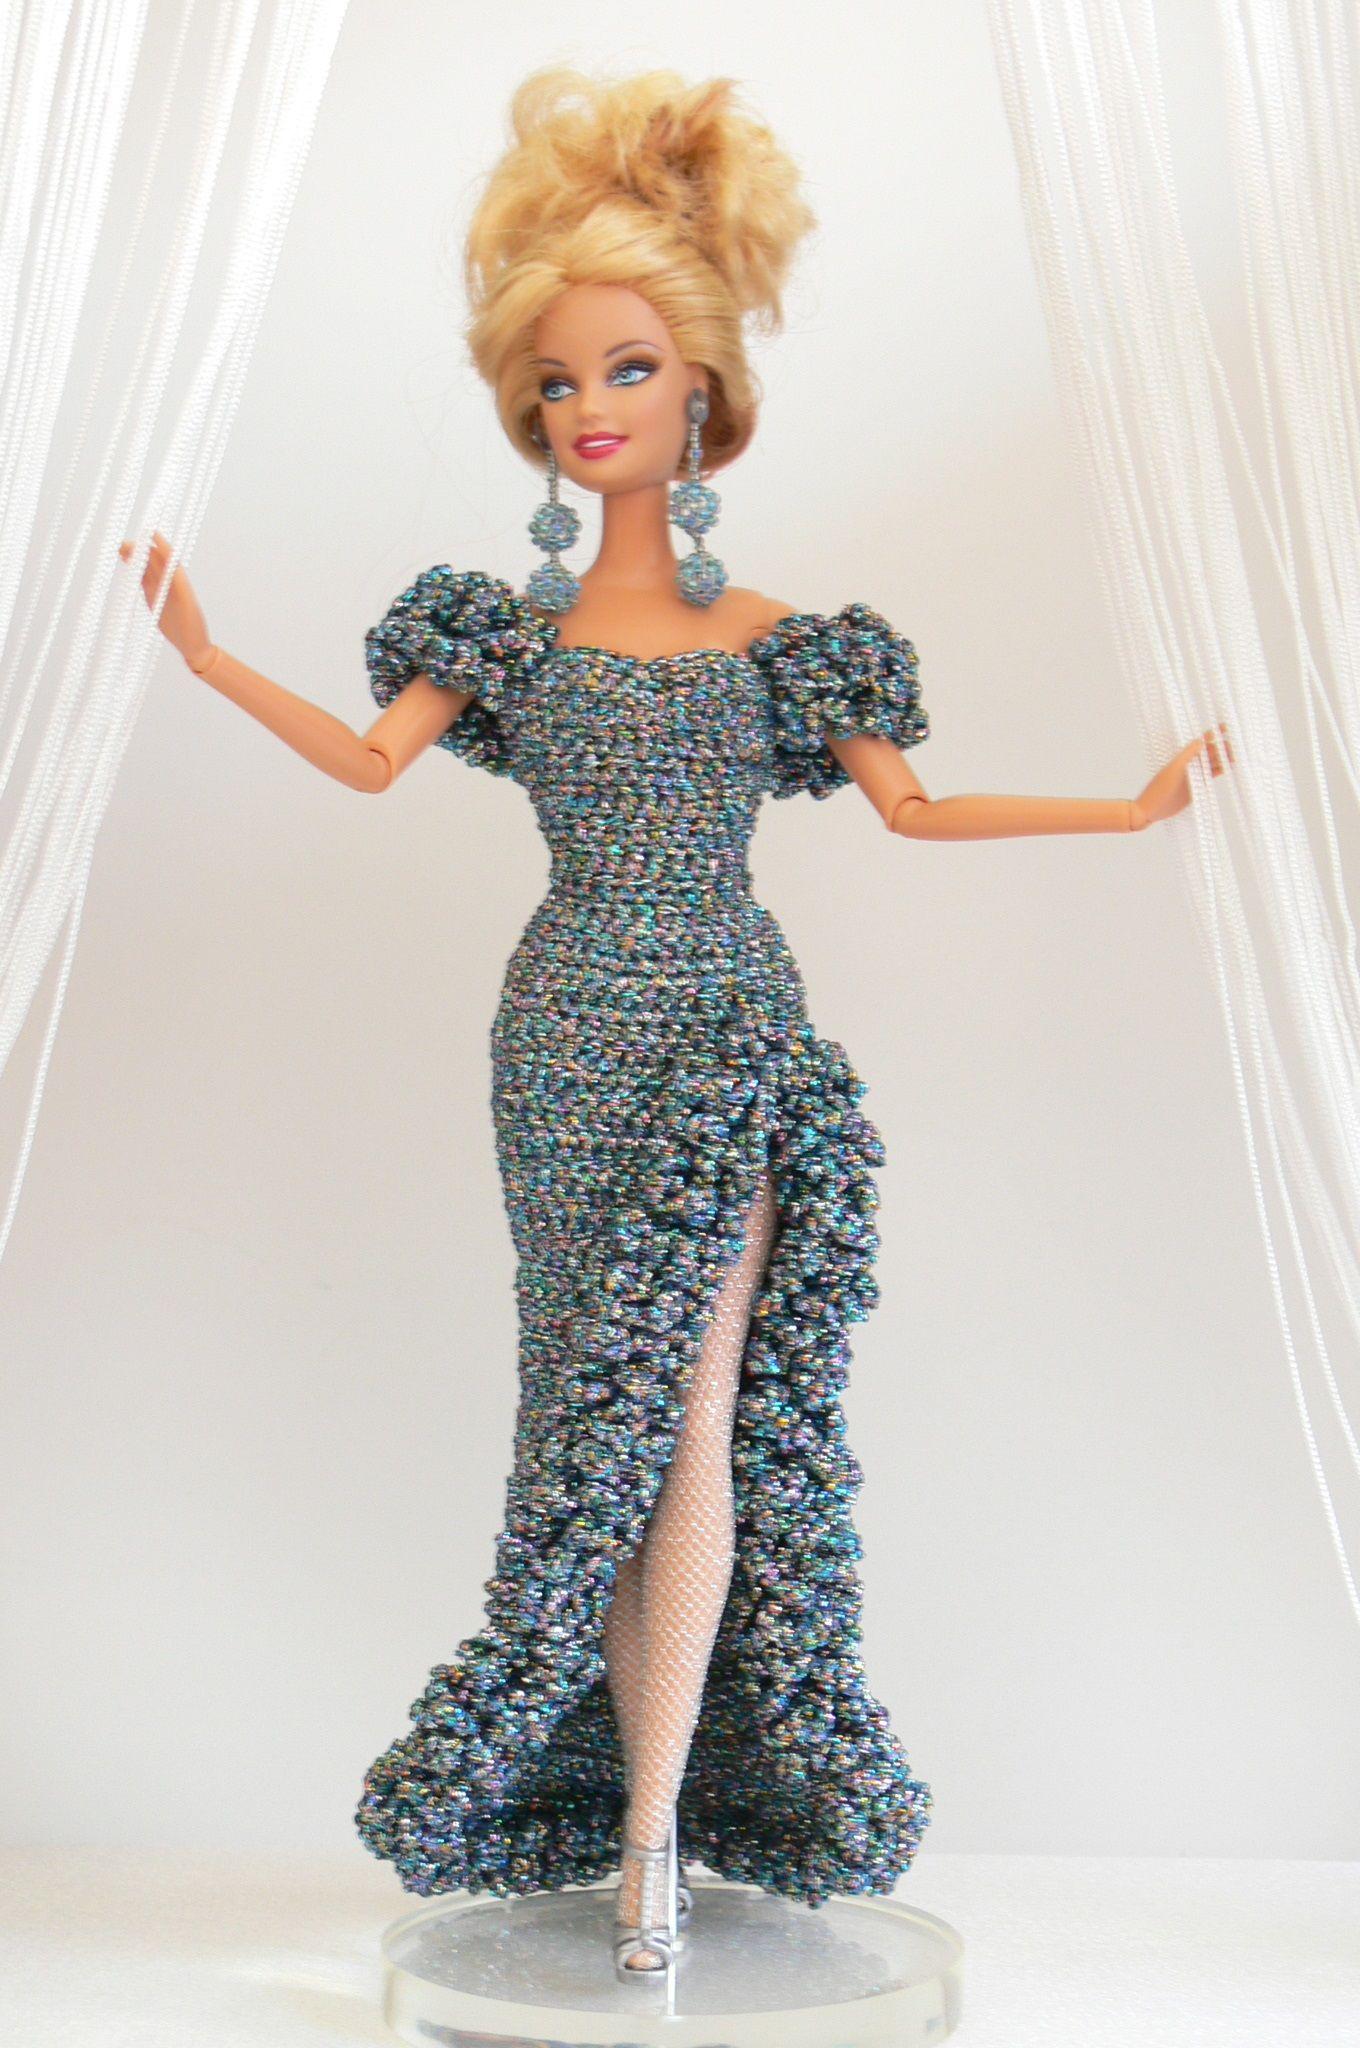 Handmade Dolls Outfit | Barbie | Pinterest | Barbie, Barbie kleider ...